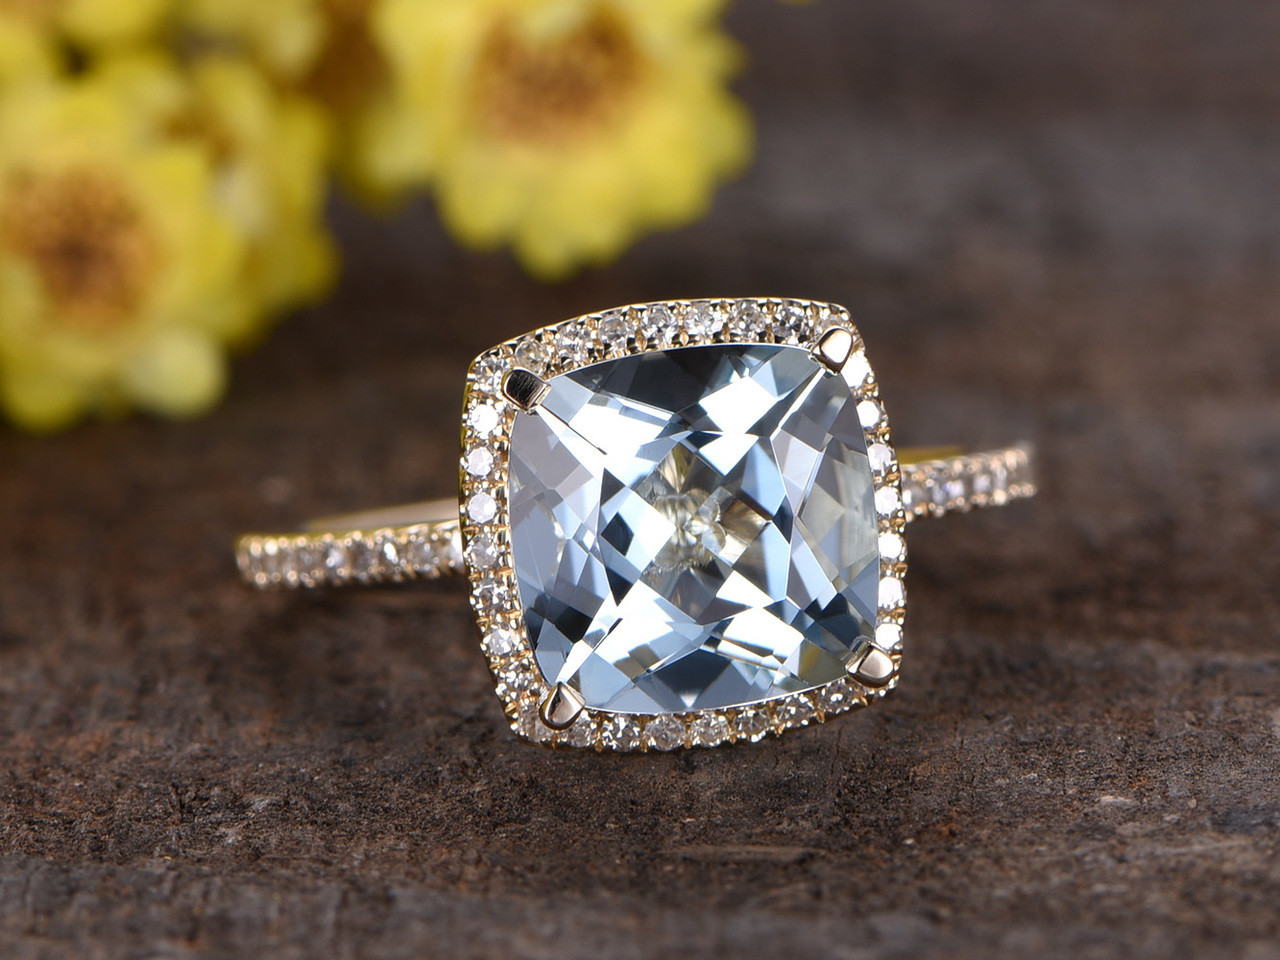 38323ee44039c 3 Carat Cushion Cut Aquamarine Diamond Engagement Ring 14k Yellow Gold  Birthstone Halo Stacking Band